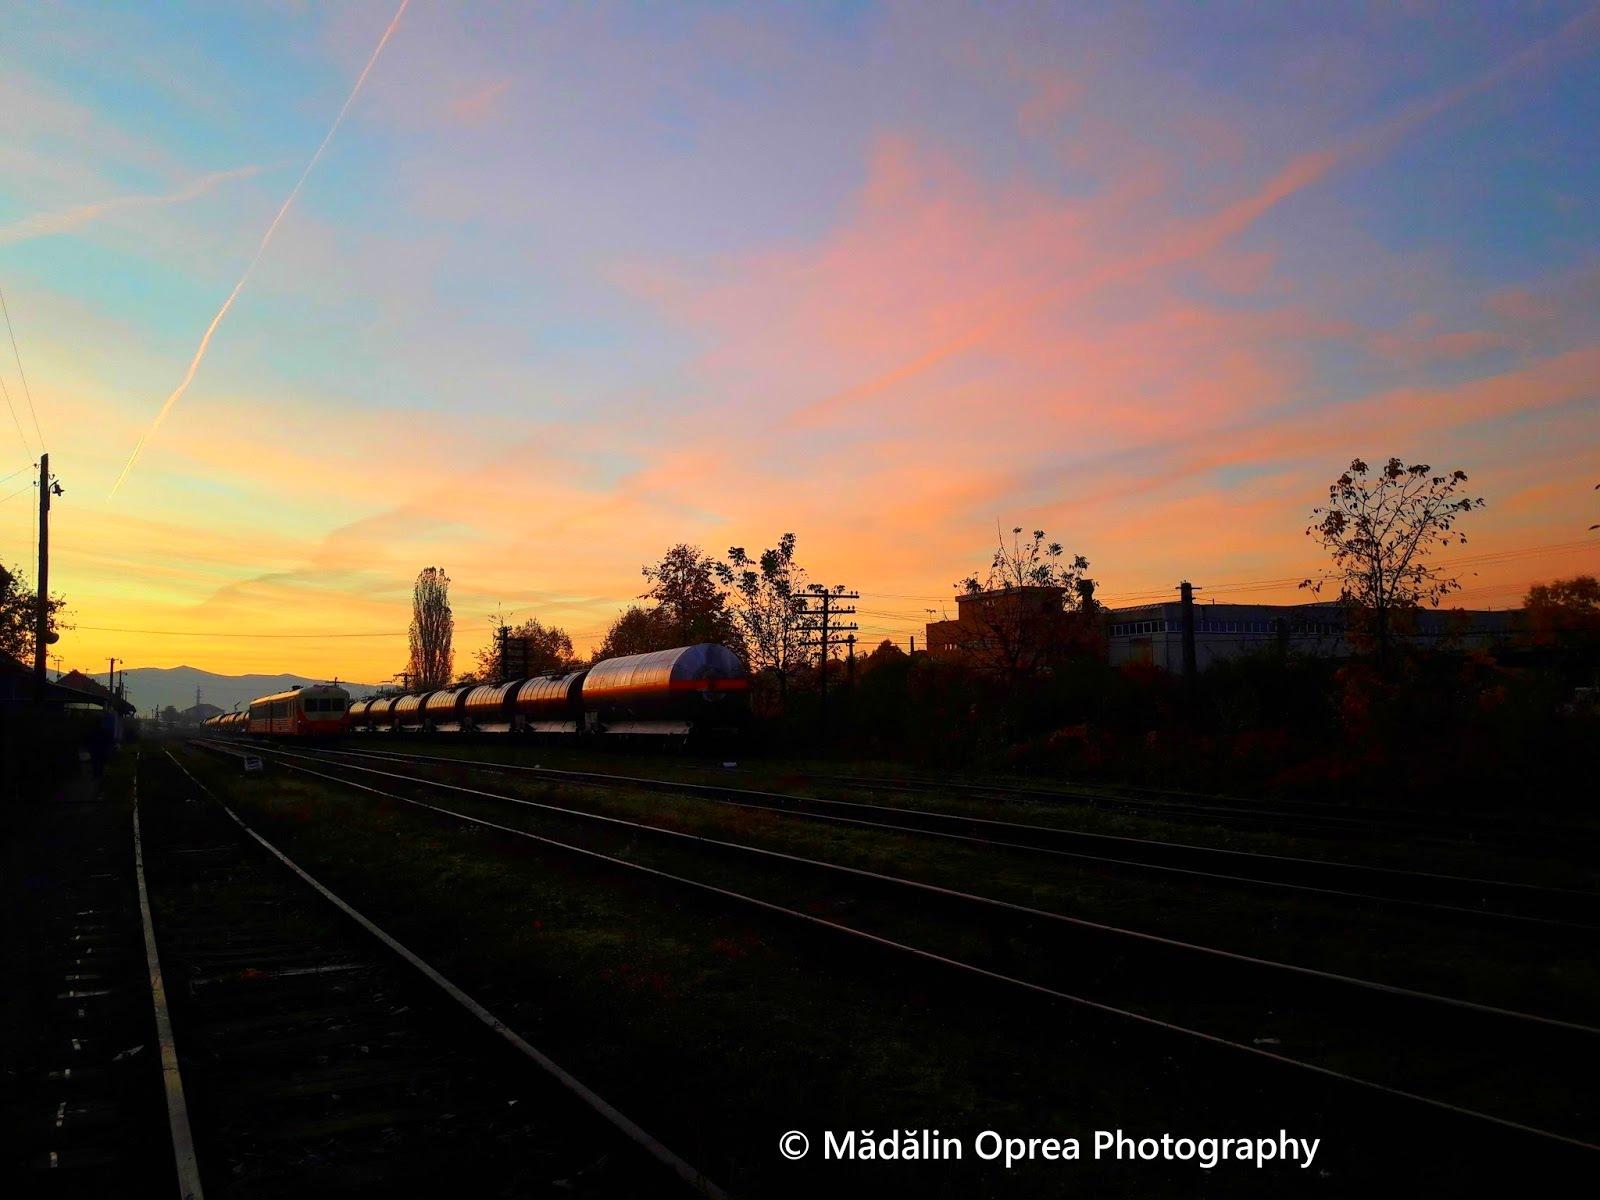 Sunrise by Mădălin Oprea Photography